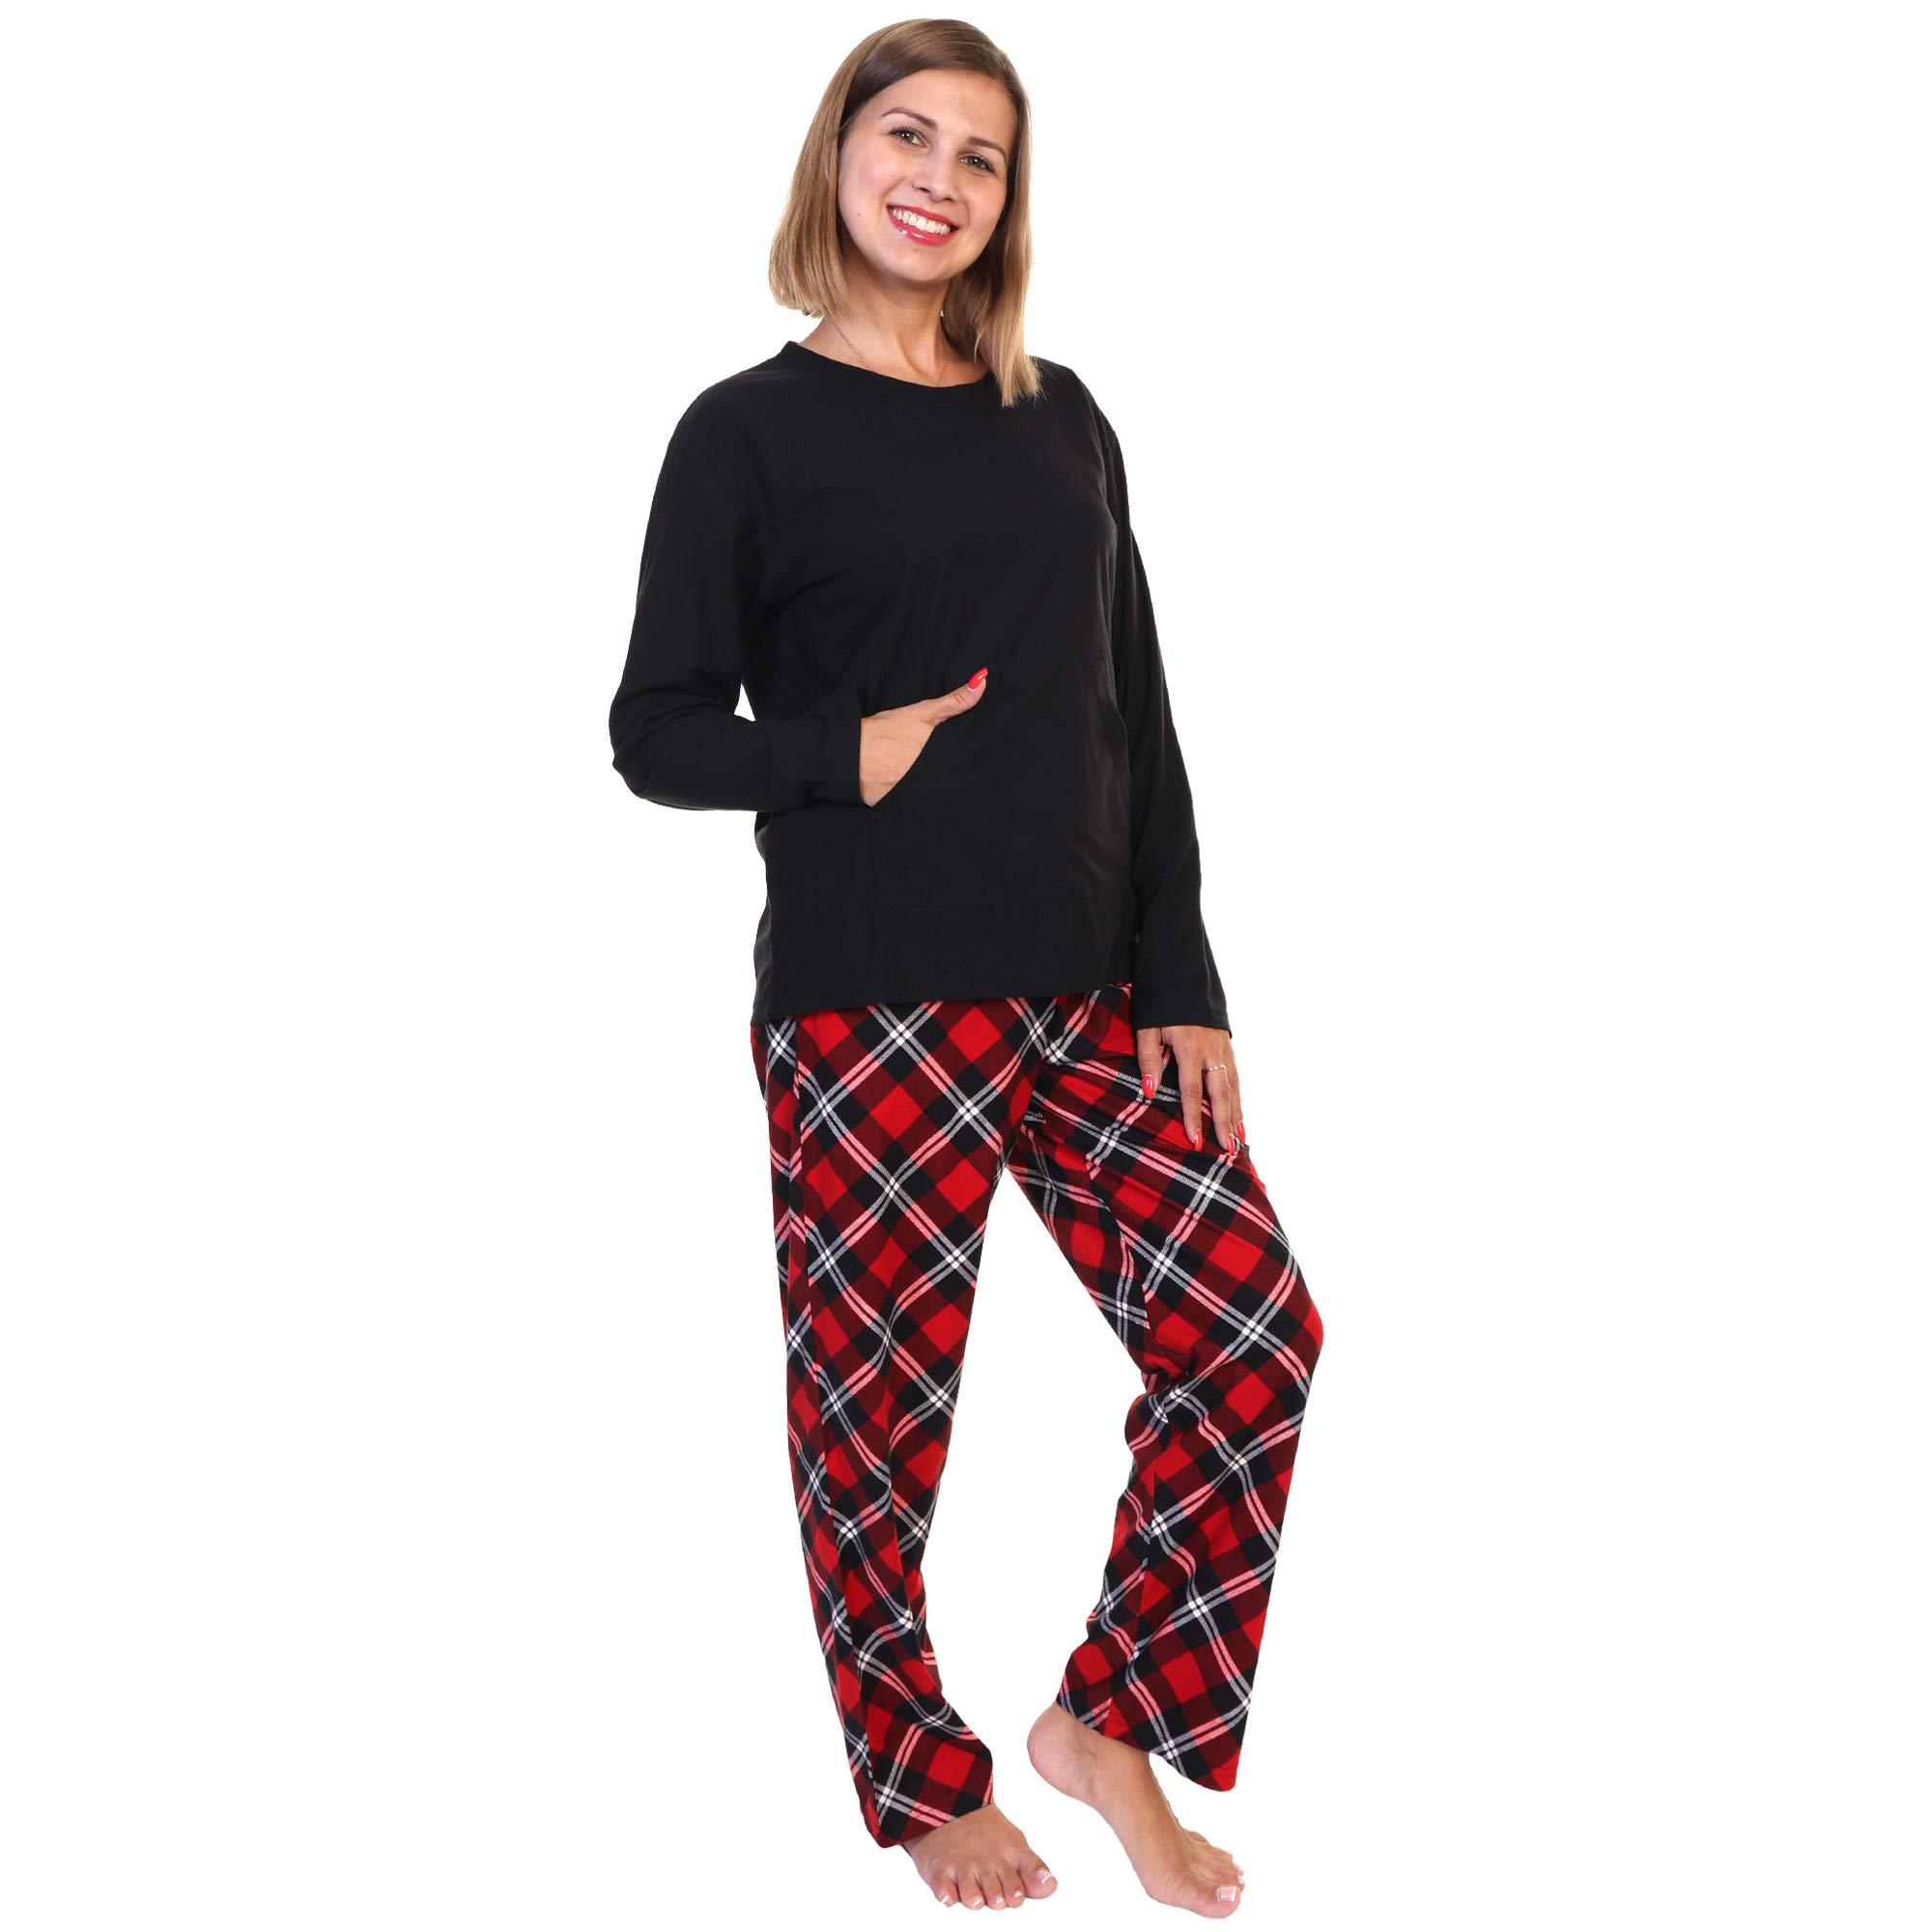 Angelina Women's Kangaroo Pocket Shirt Top with Flannel Pants Pajama Set